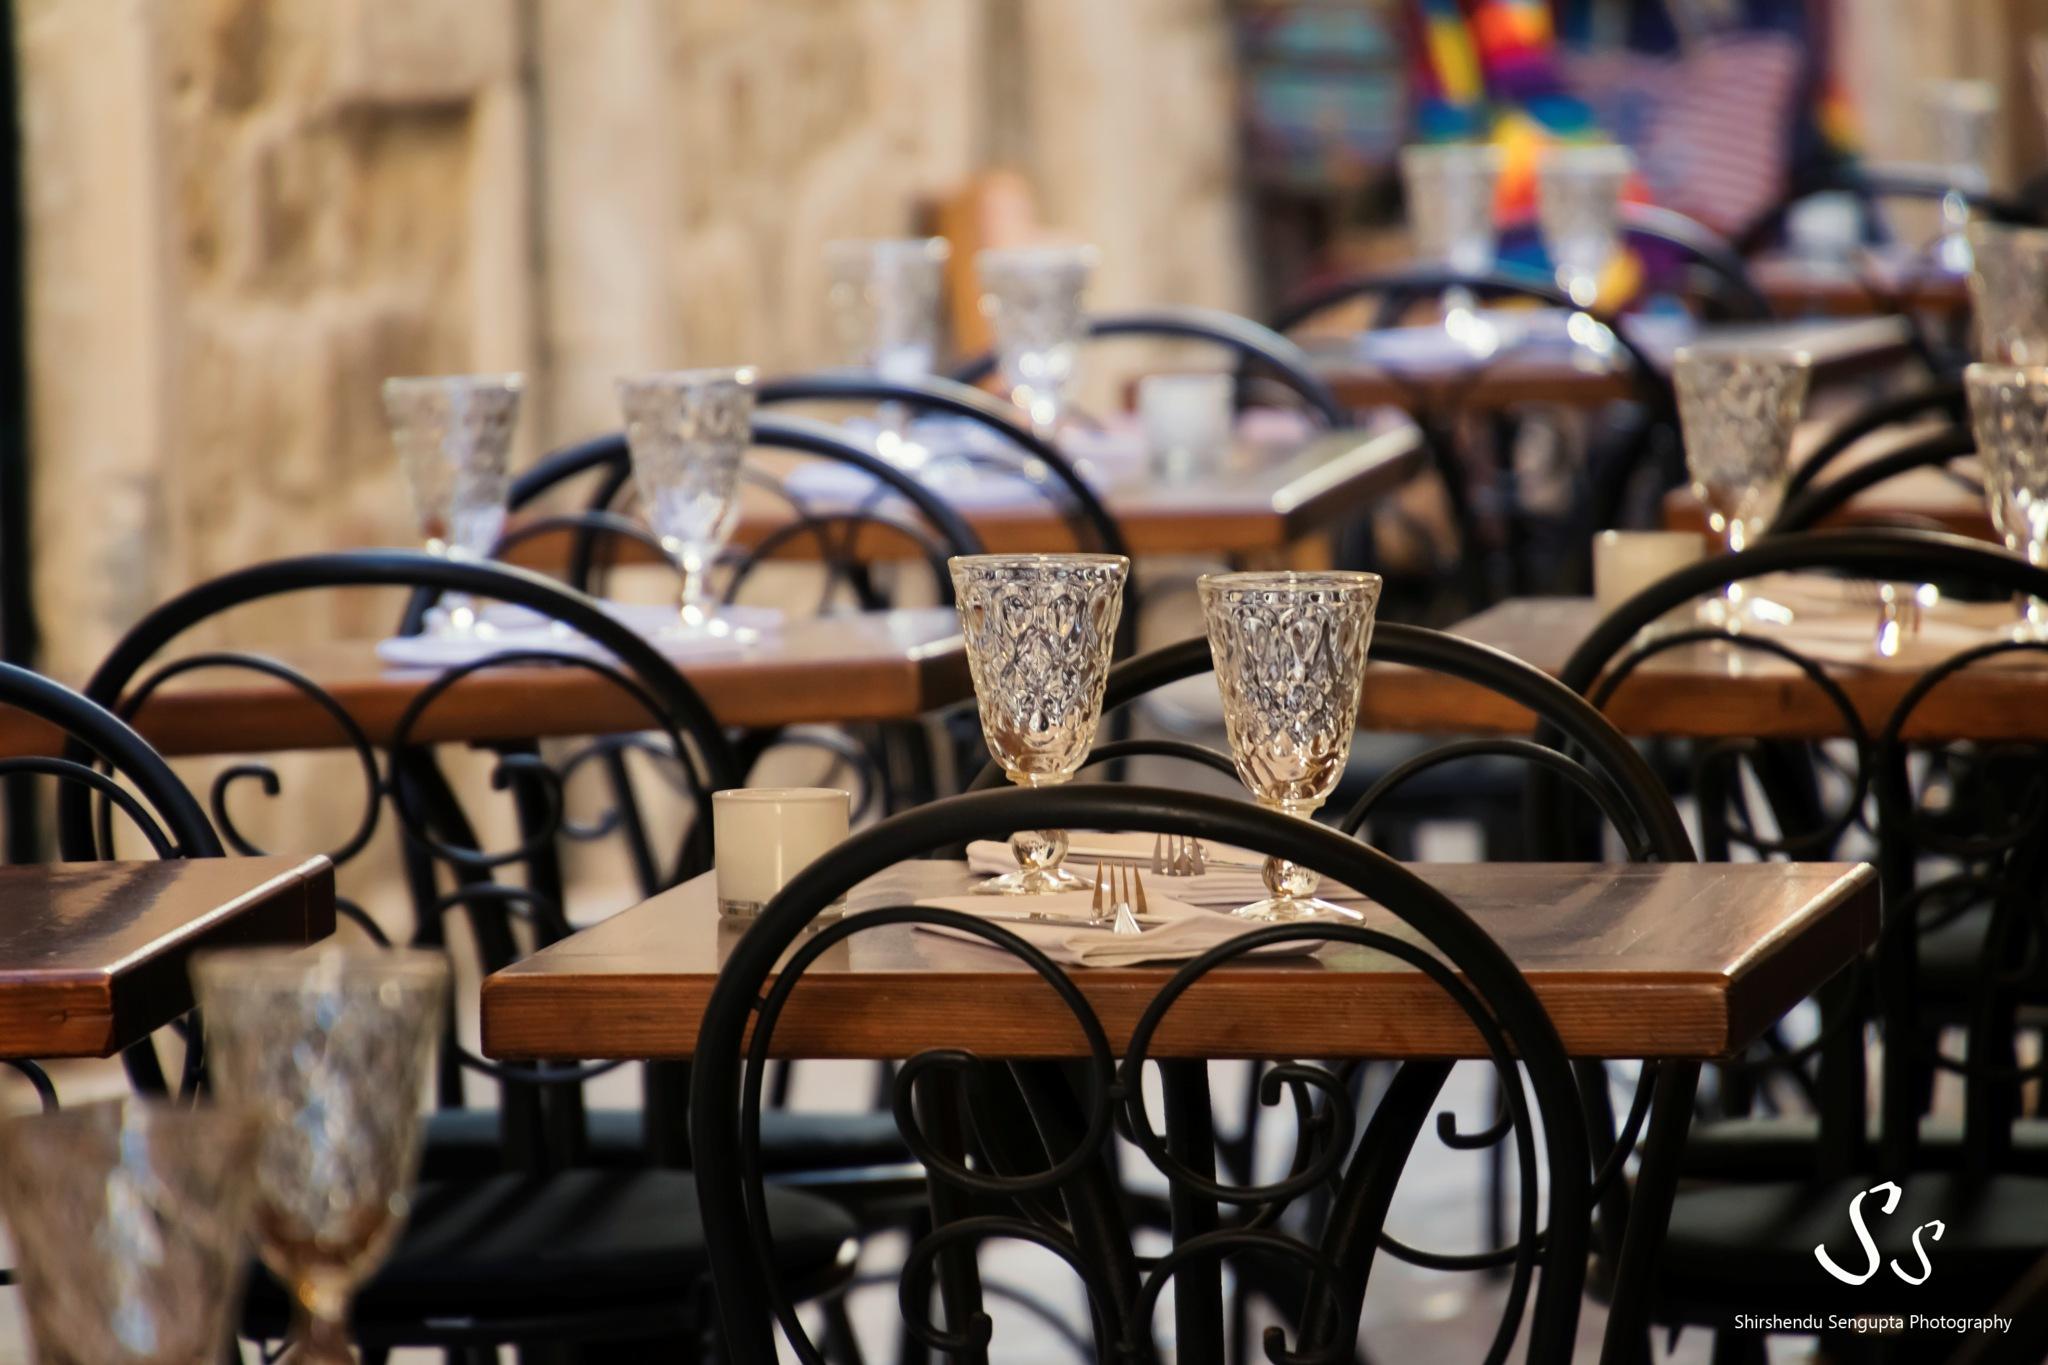 Dubrovnik by shirshendu.sengupta.9